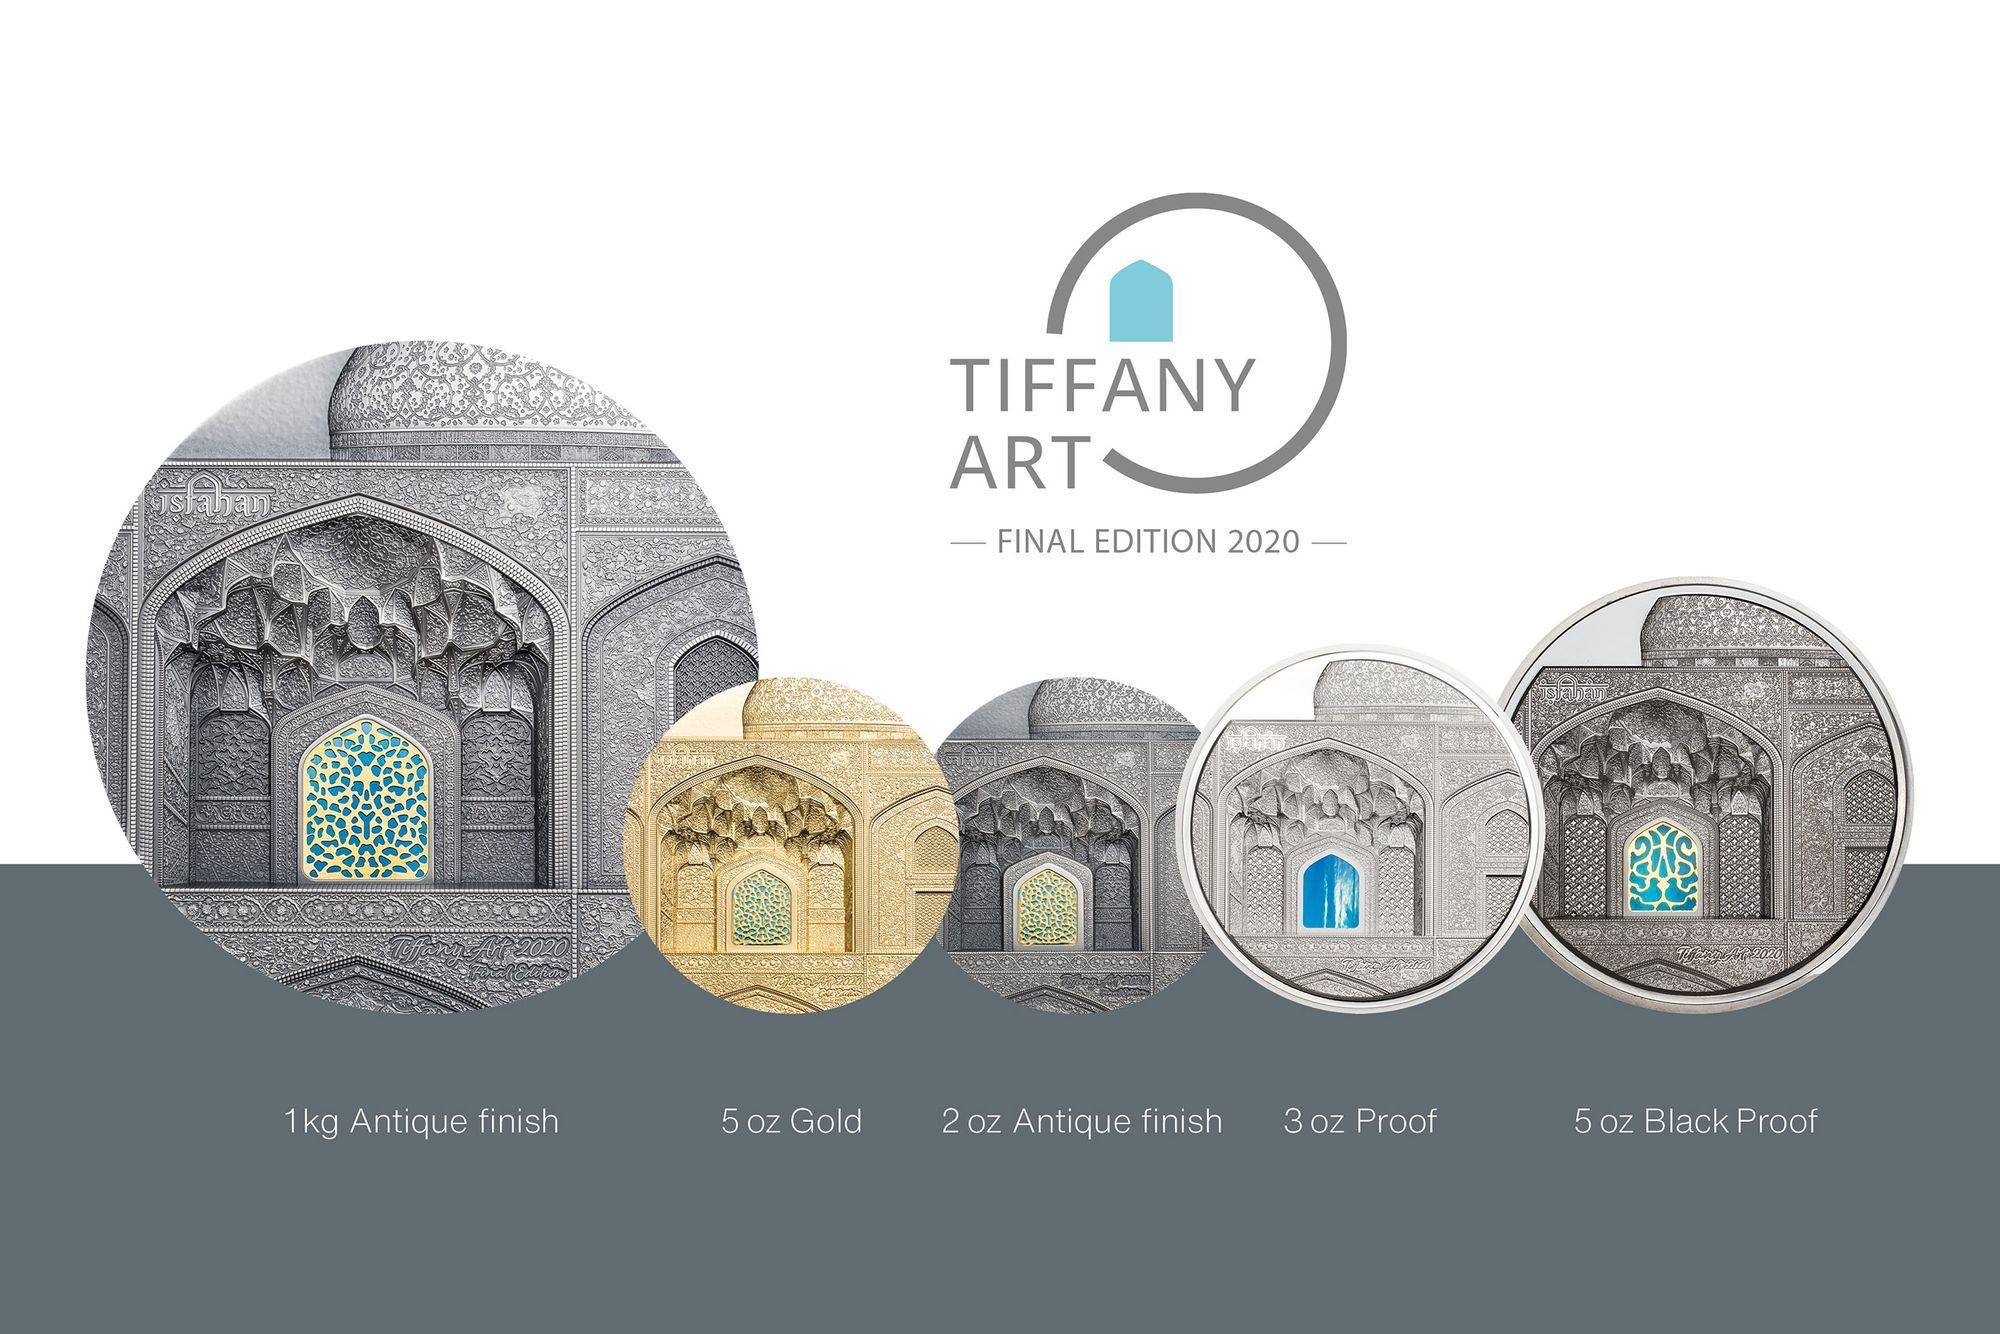 2020 Tiffany Art Coins